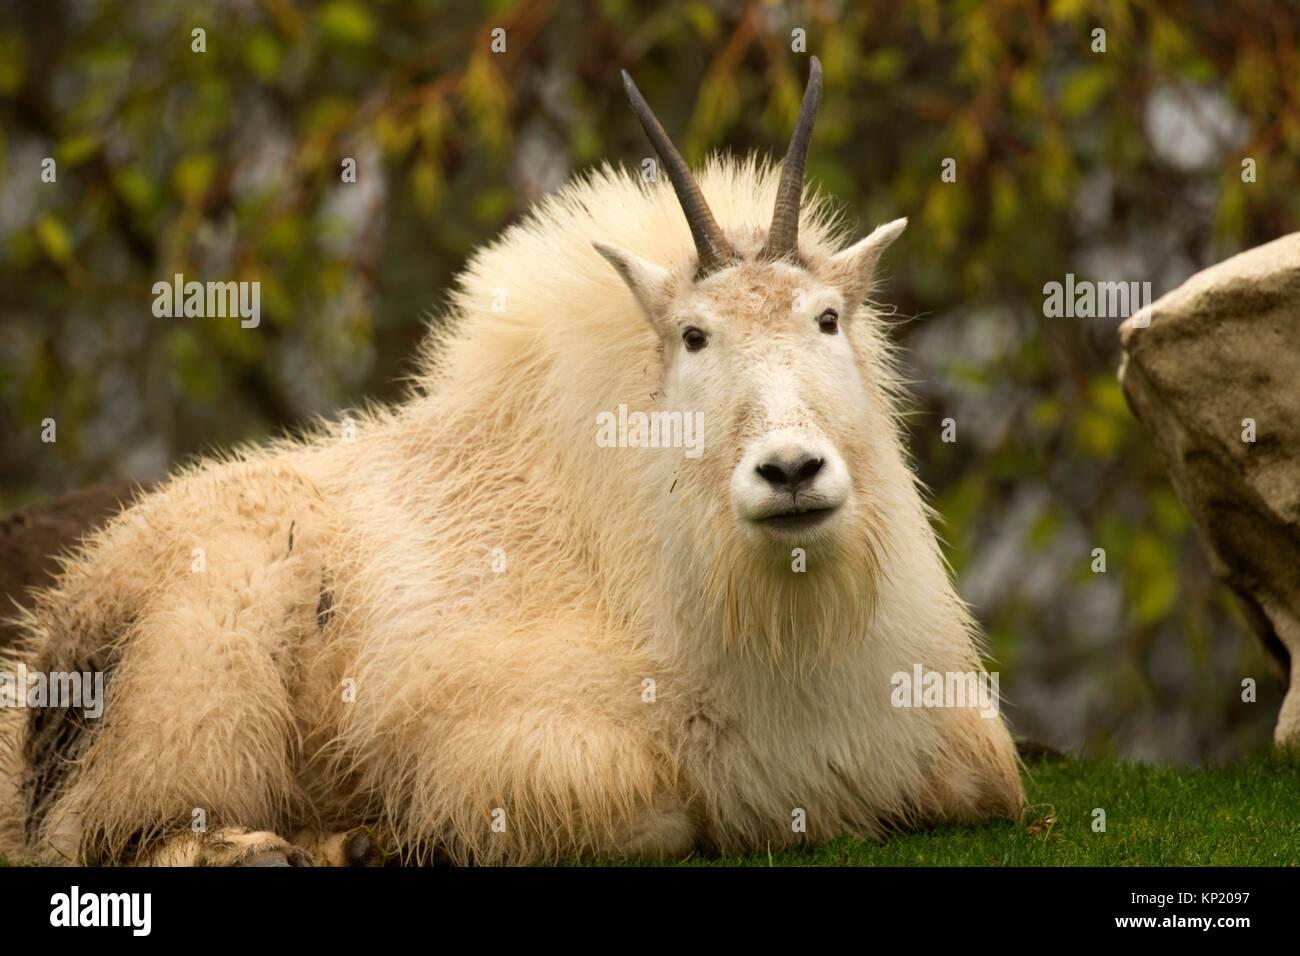 La chèvre de montagne (Oreamnos americanus), Zoo de l'Oregon, Washington Park, Portland, Oregon. Photo Stock